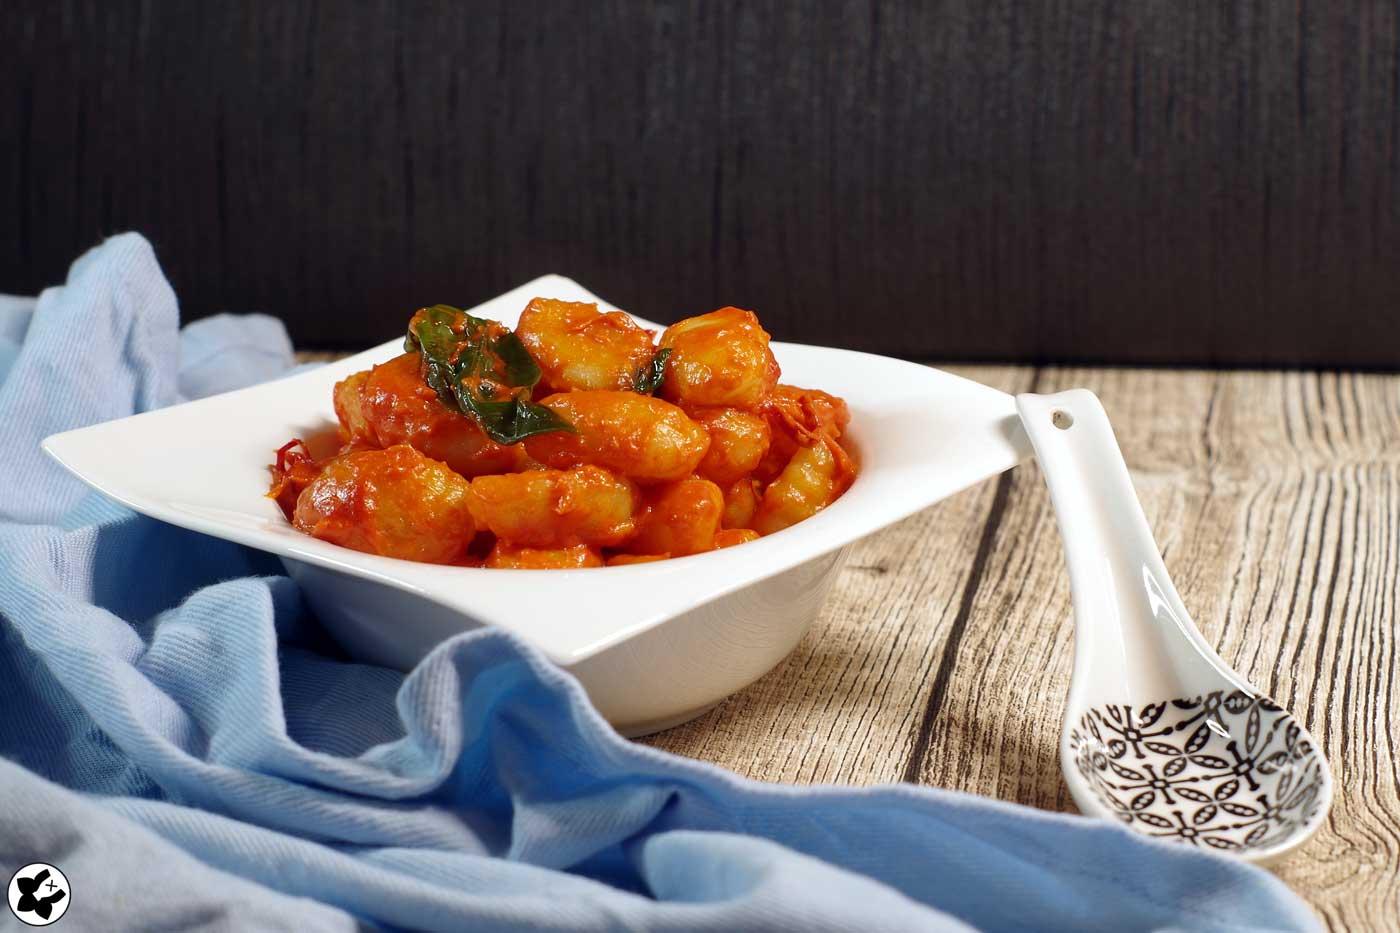 Gnocchi in Knoblauch-Tomatensoße